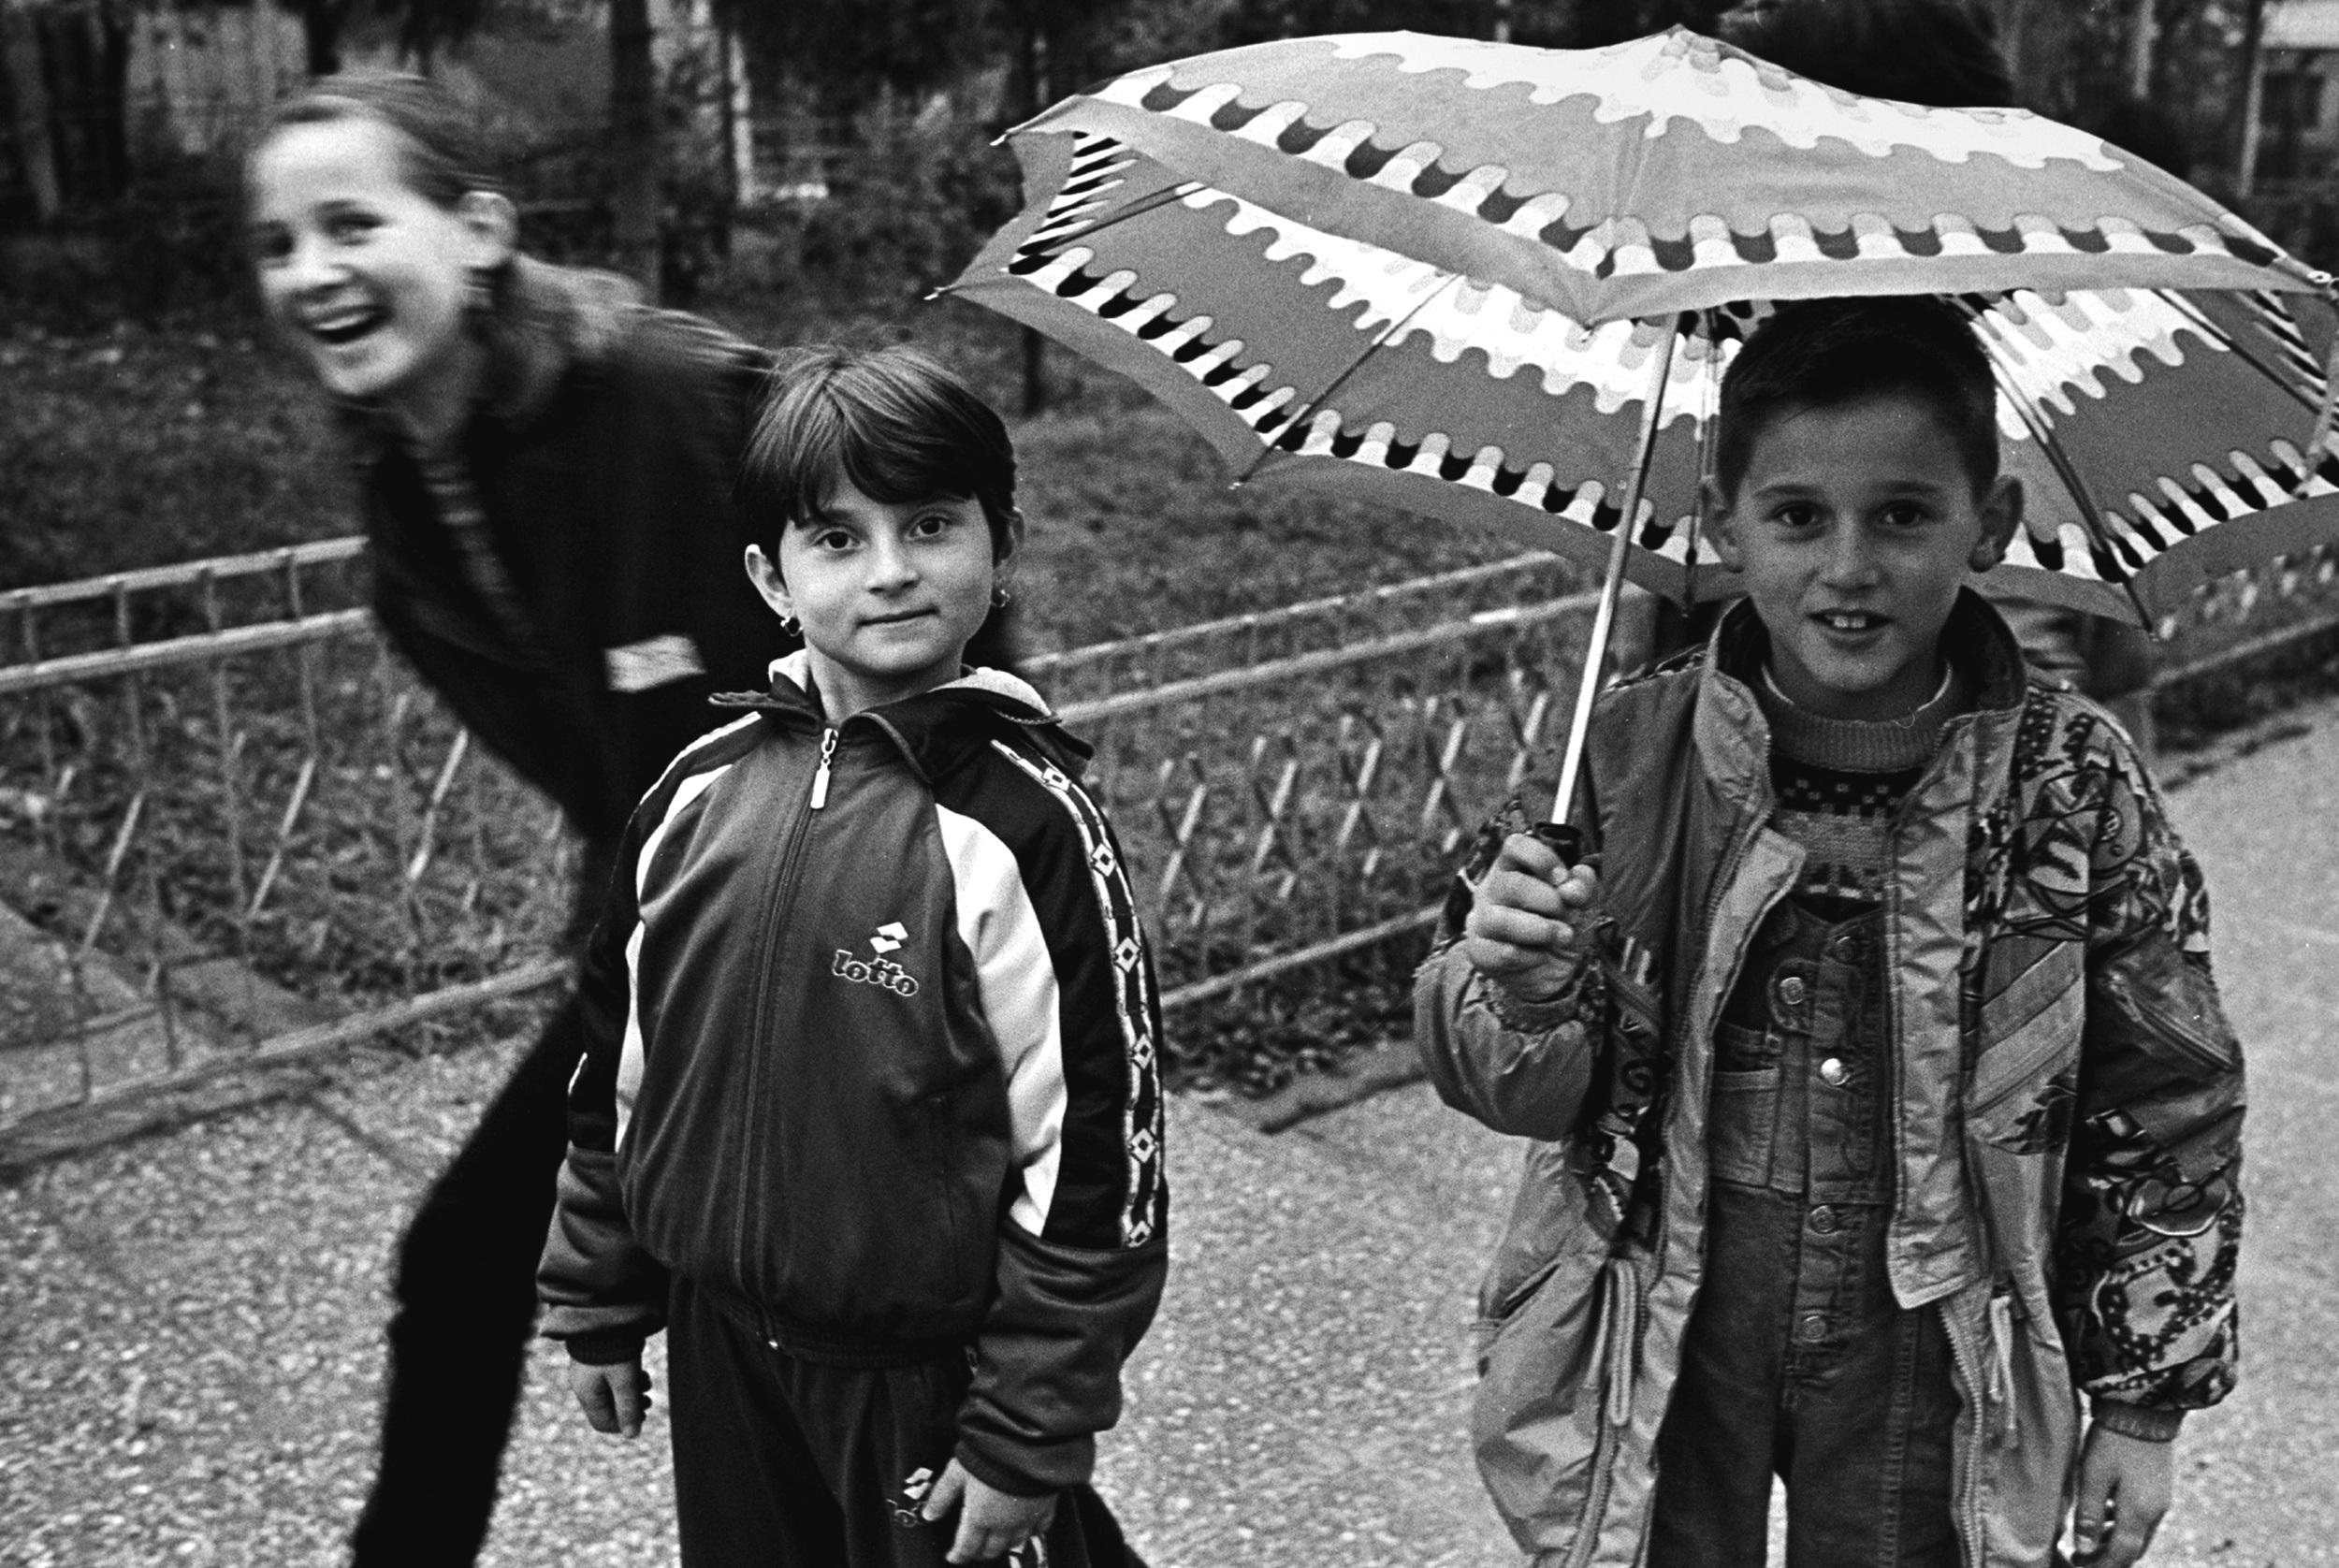 Pristina, Kosovo, 1999